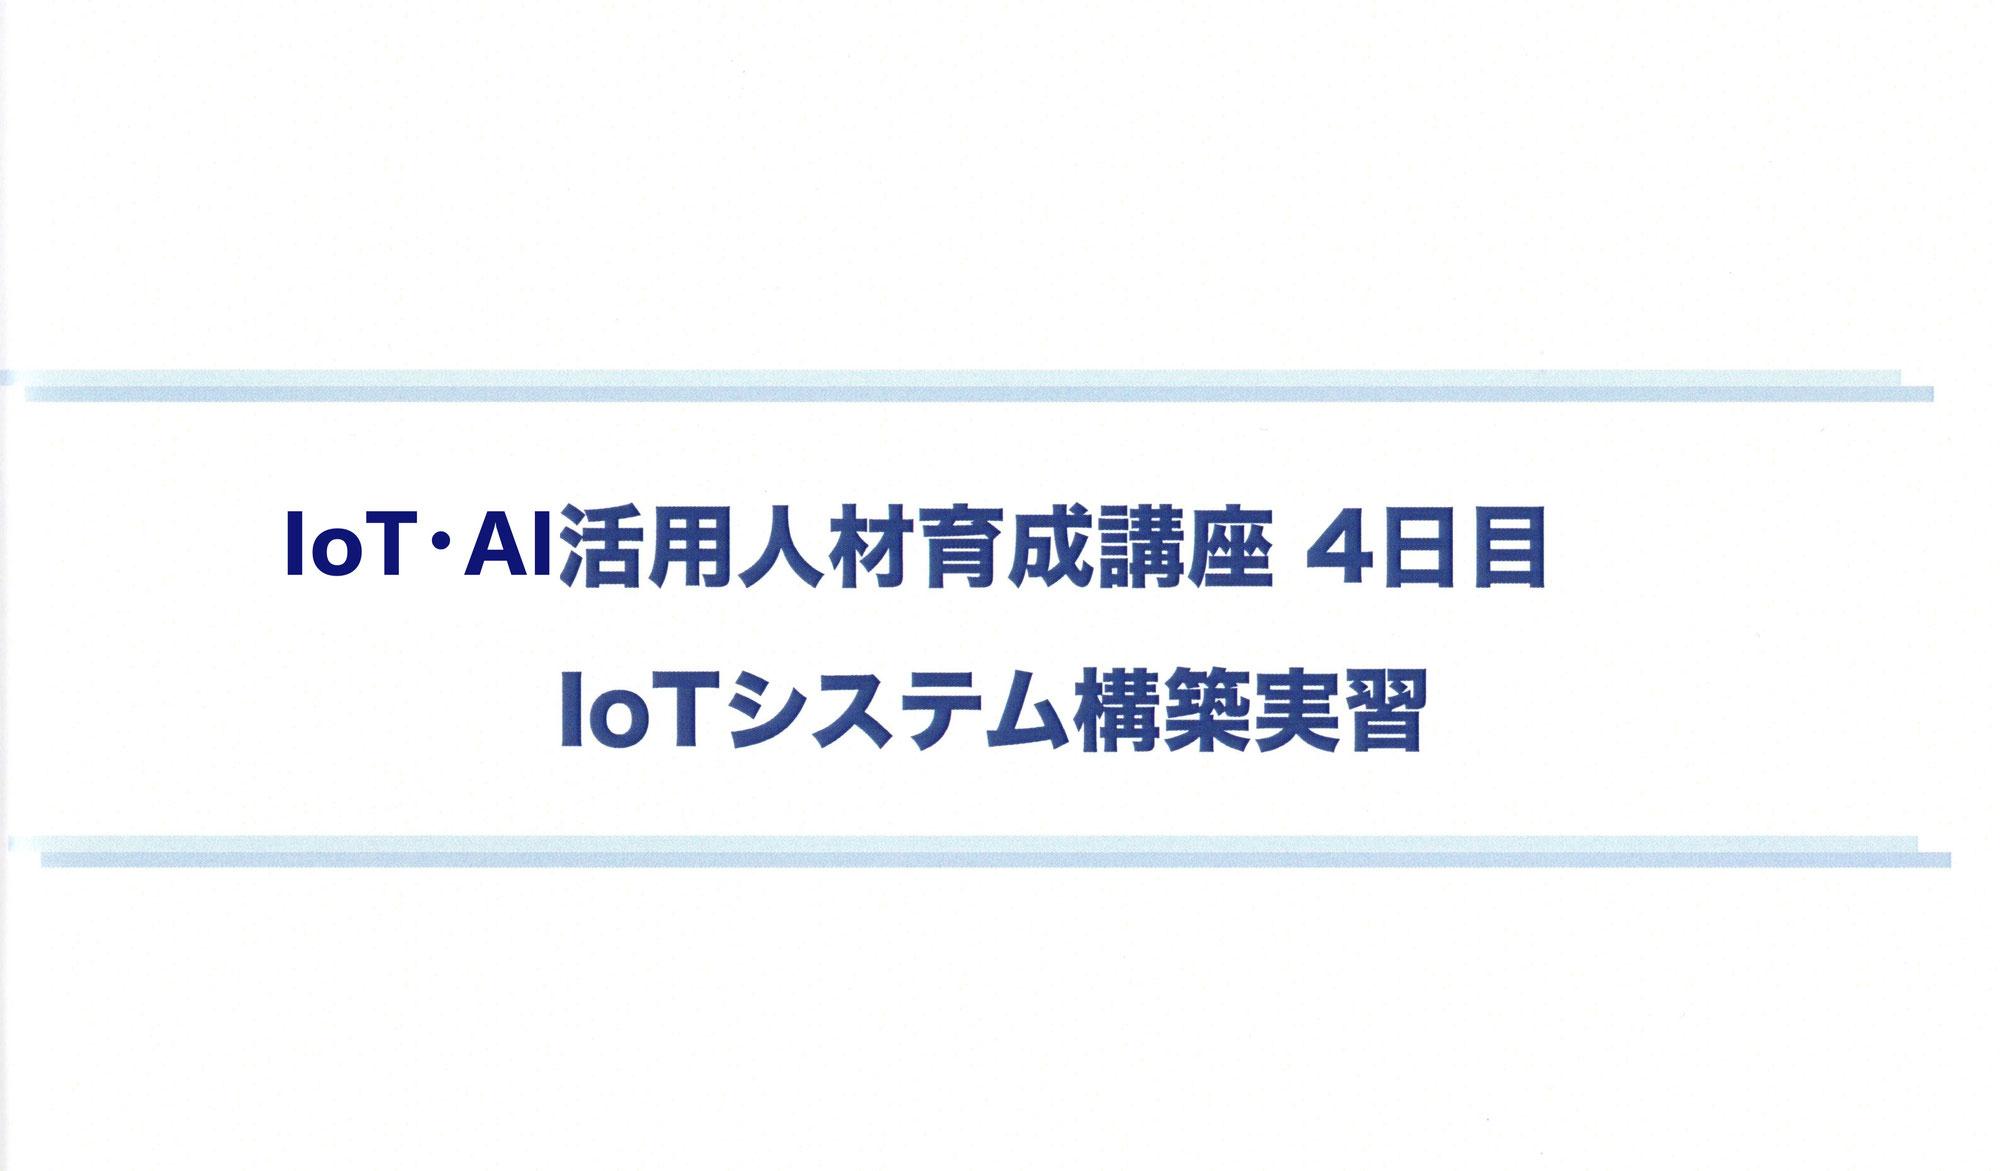 IoT・AI活用人材育成講座の4日目を開催しました